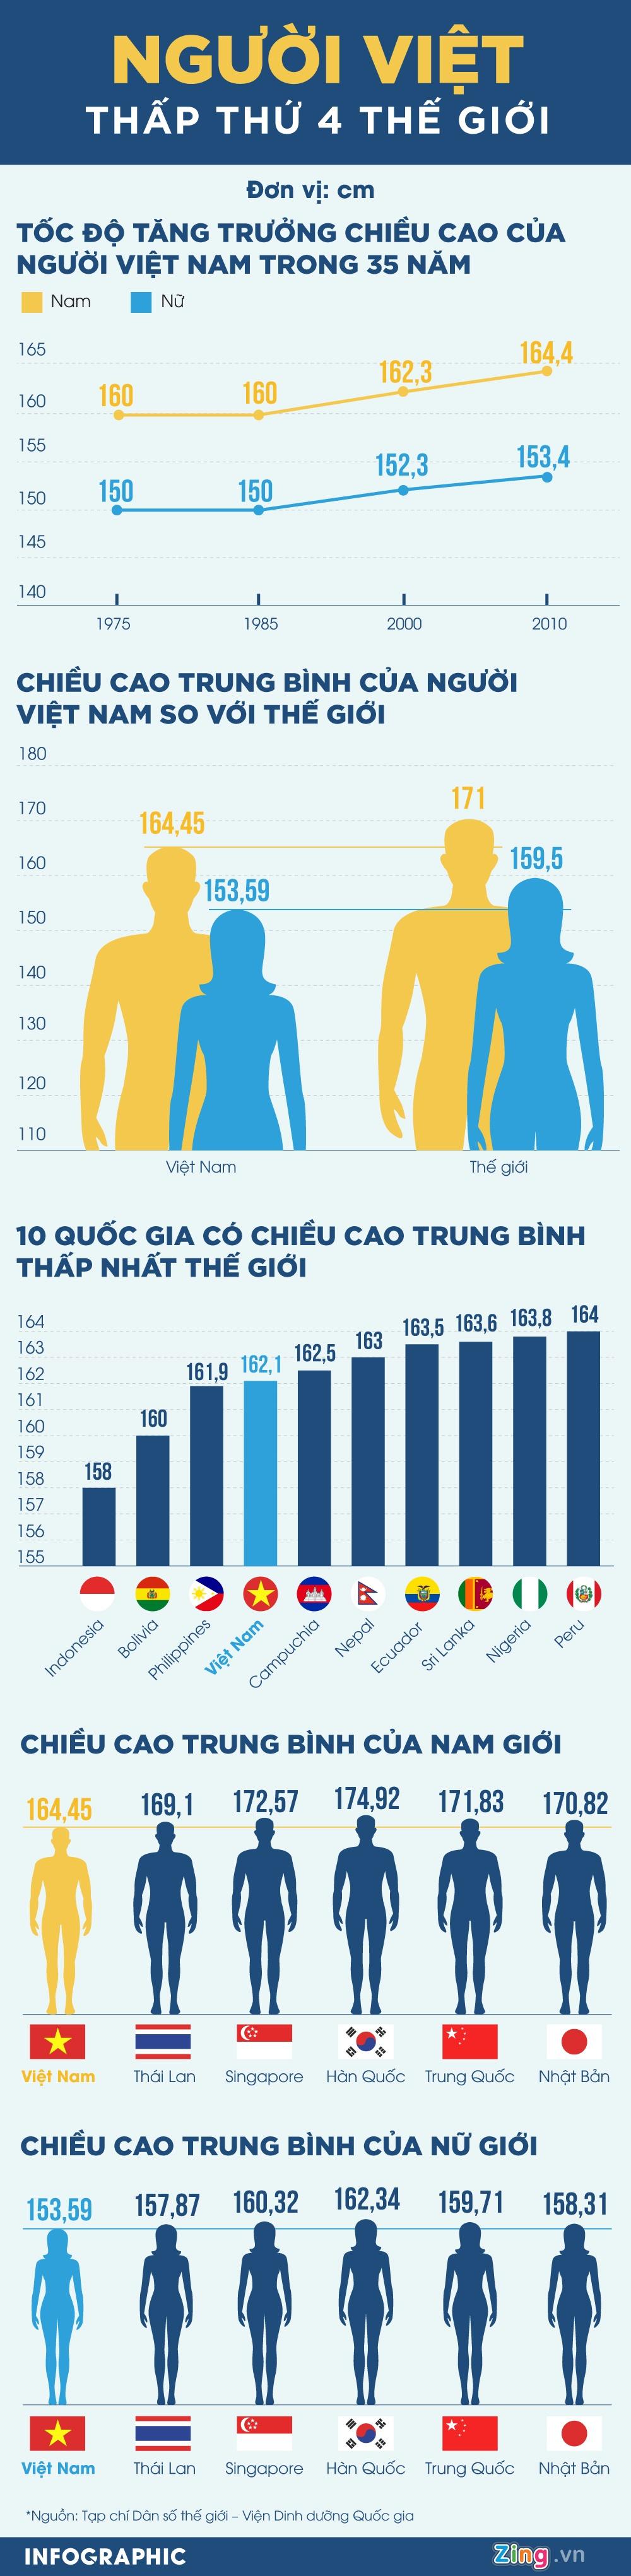 Nguoi Viet Nam lun thu tu the gioi, 35 nam chi cao them 4 cm hinh anh 1